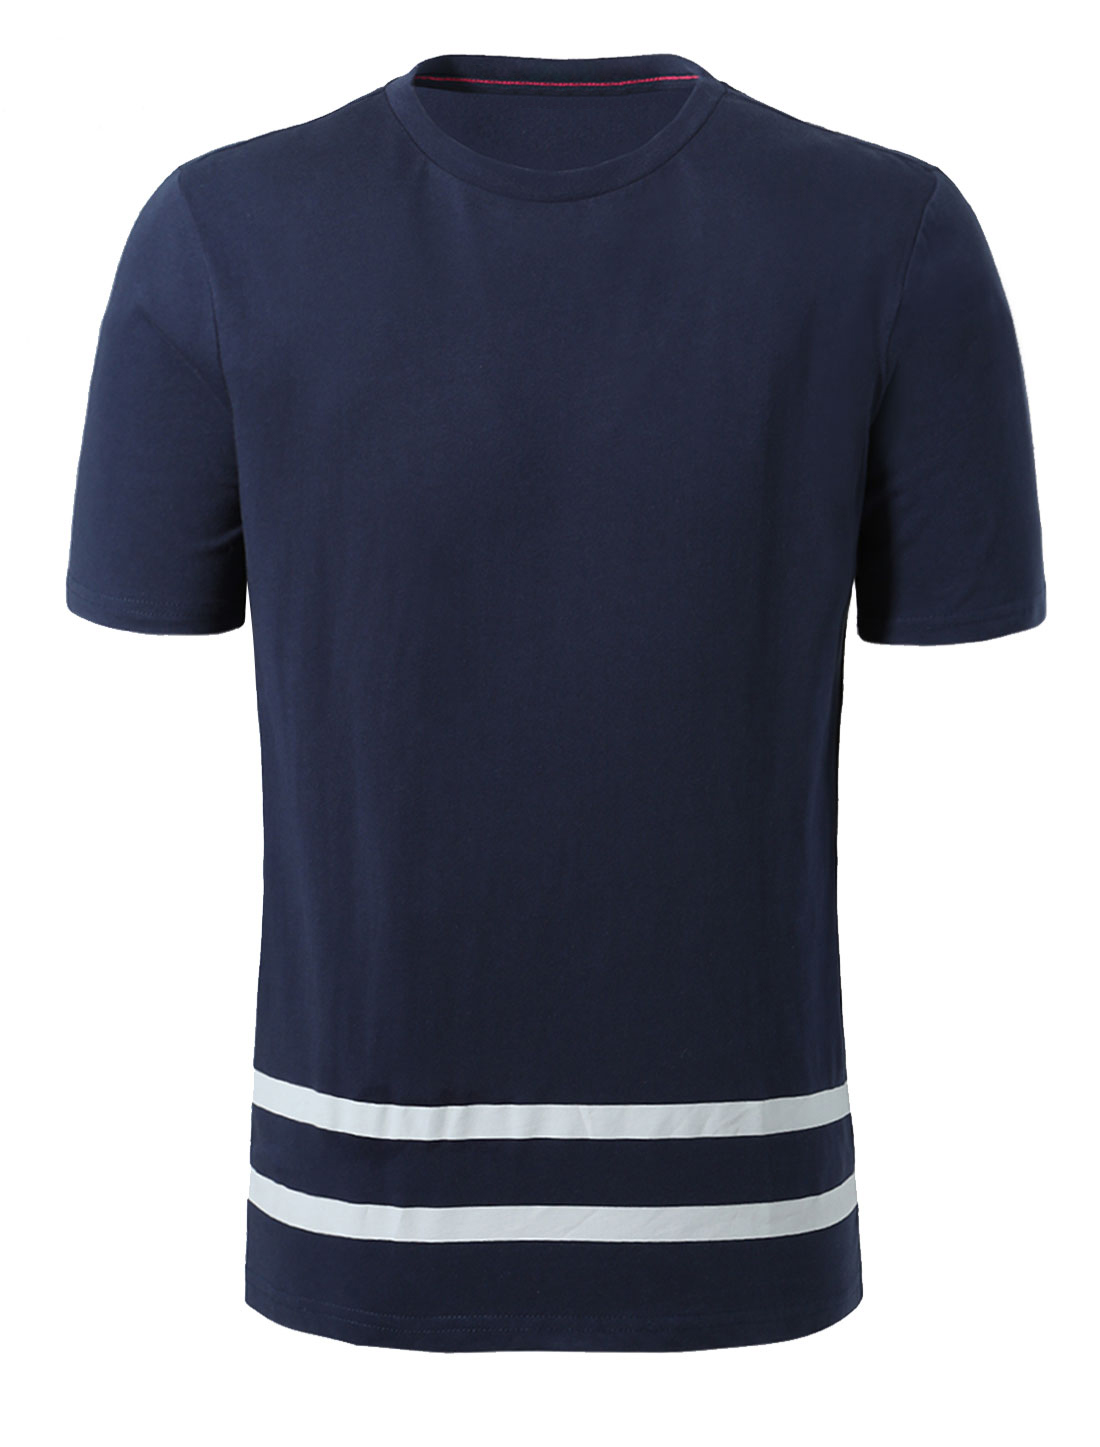 Men Striped Hem Round Neck Short Sleeves Cotton T-Shirt Navy Blue S